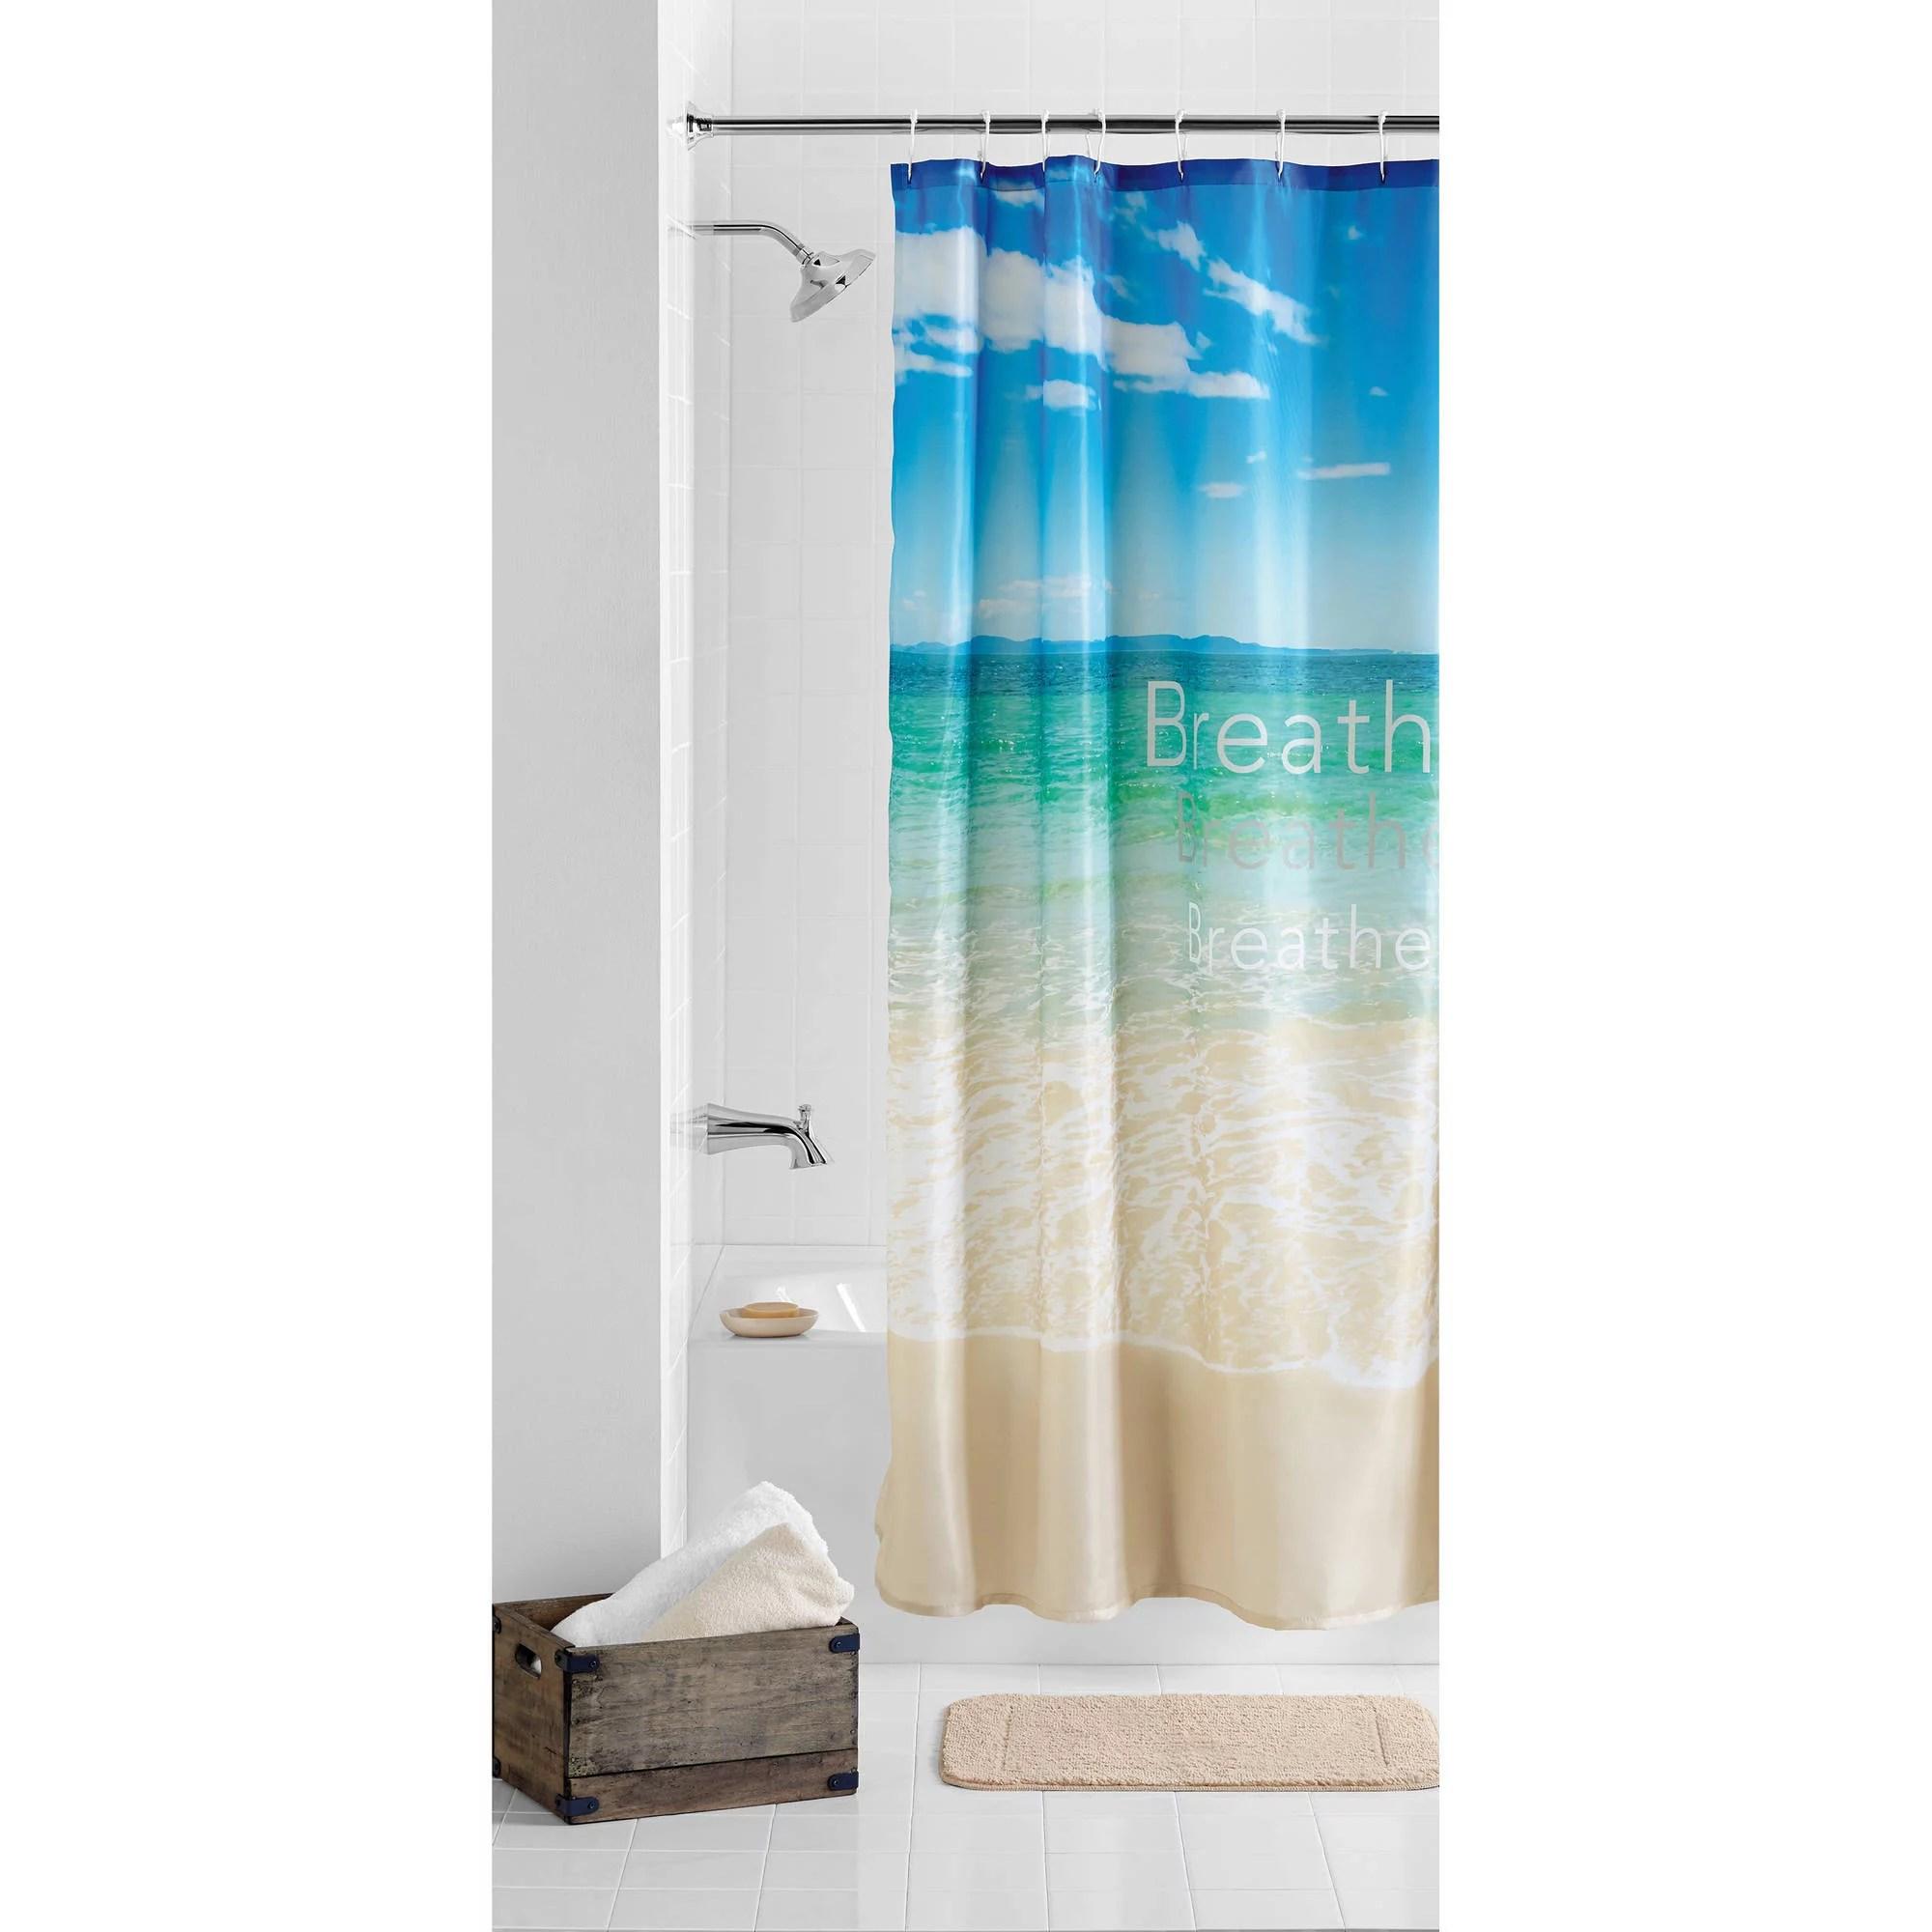 mainstays photoreal breathe beach polyester taffeta printed scenic fabric shower curtain multi 70 x 72 walmart com